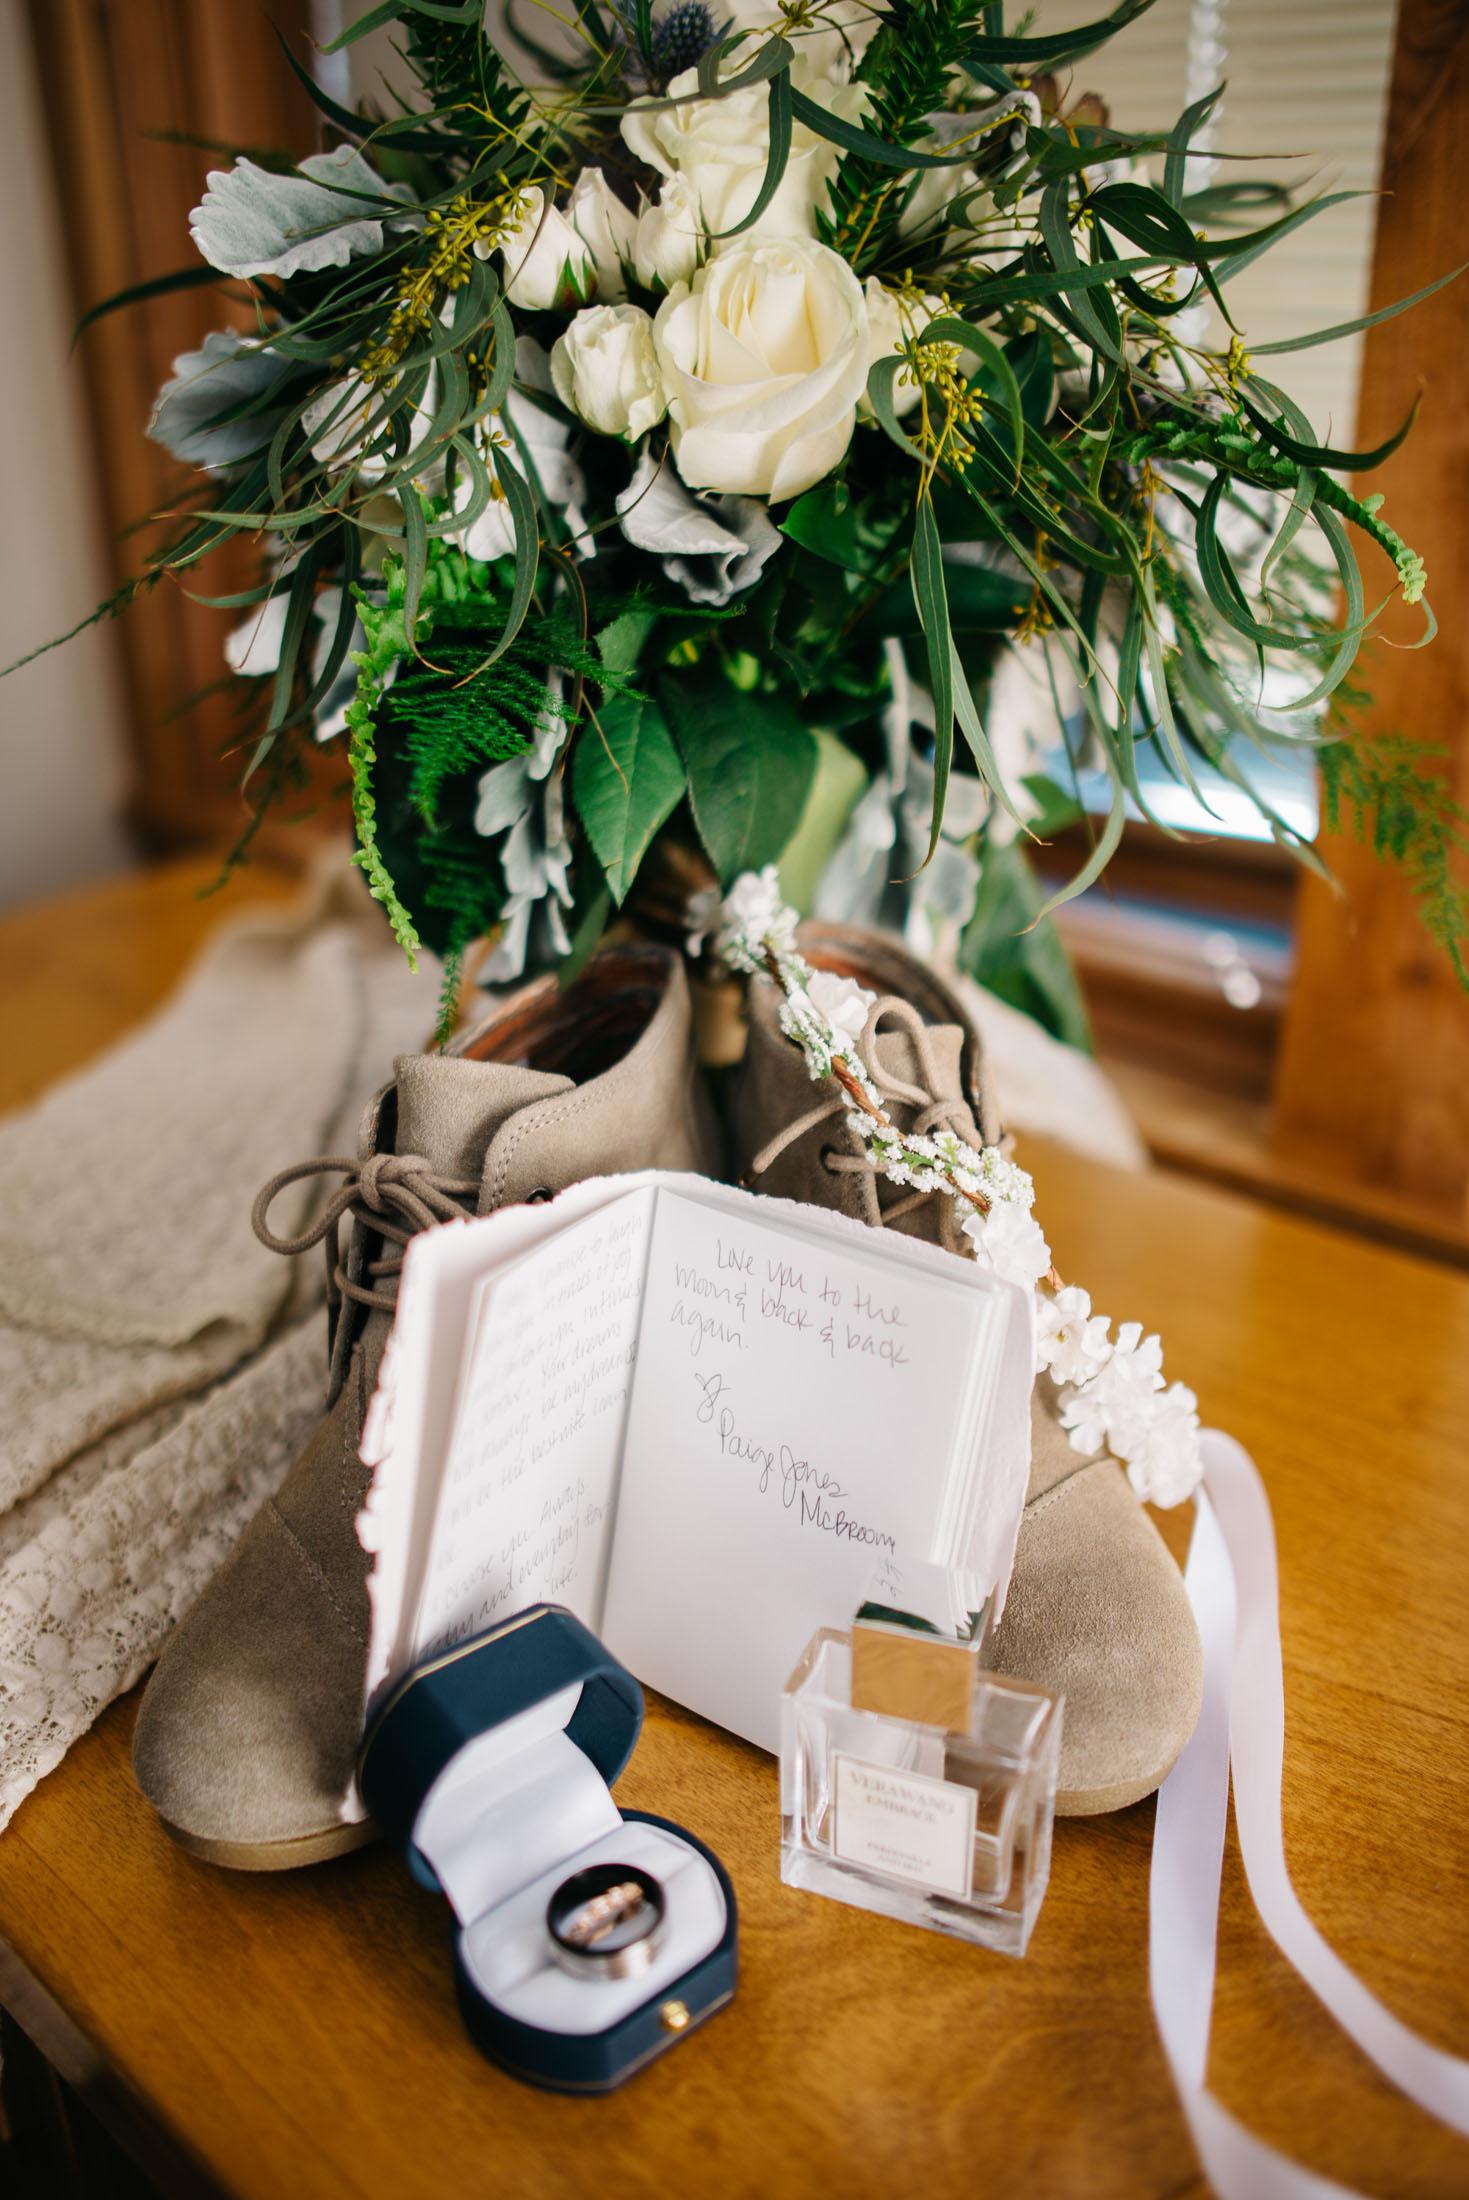 56elopement-photographer-colorado-telluride-winter-wedding-mountain-wedding-photographer-paige&chad-0179.jpg